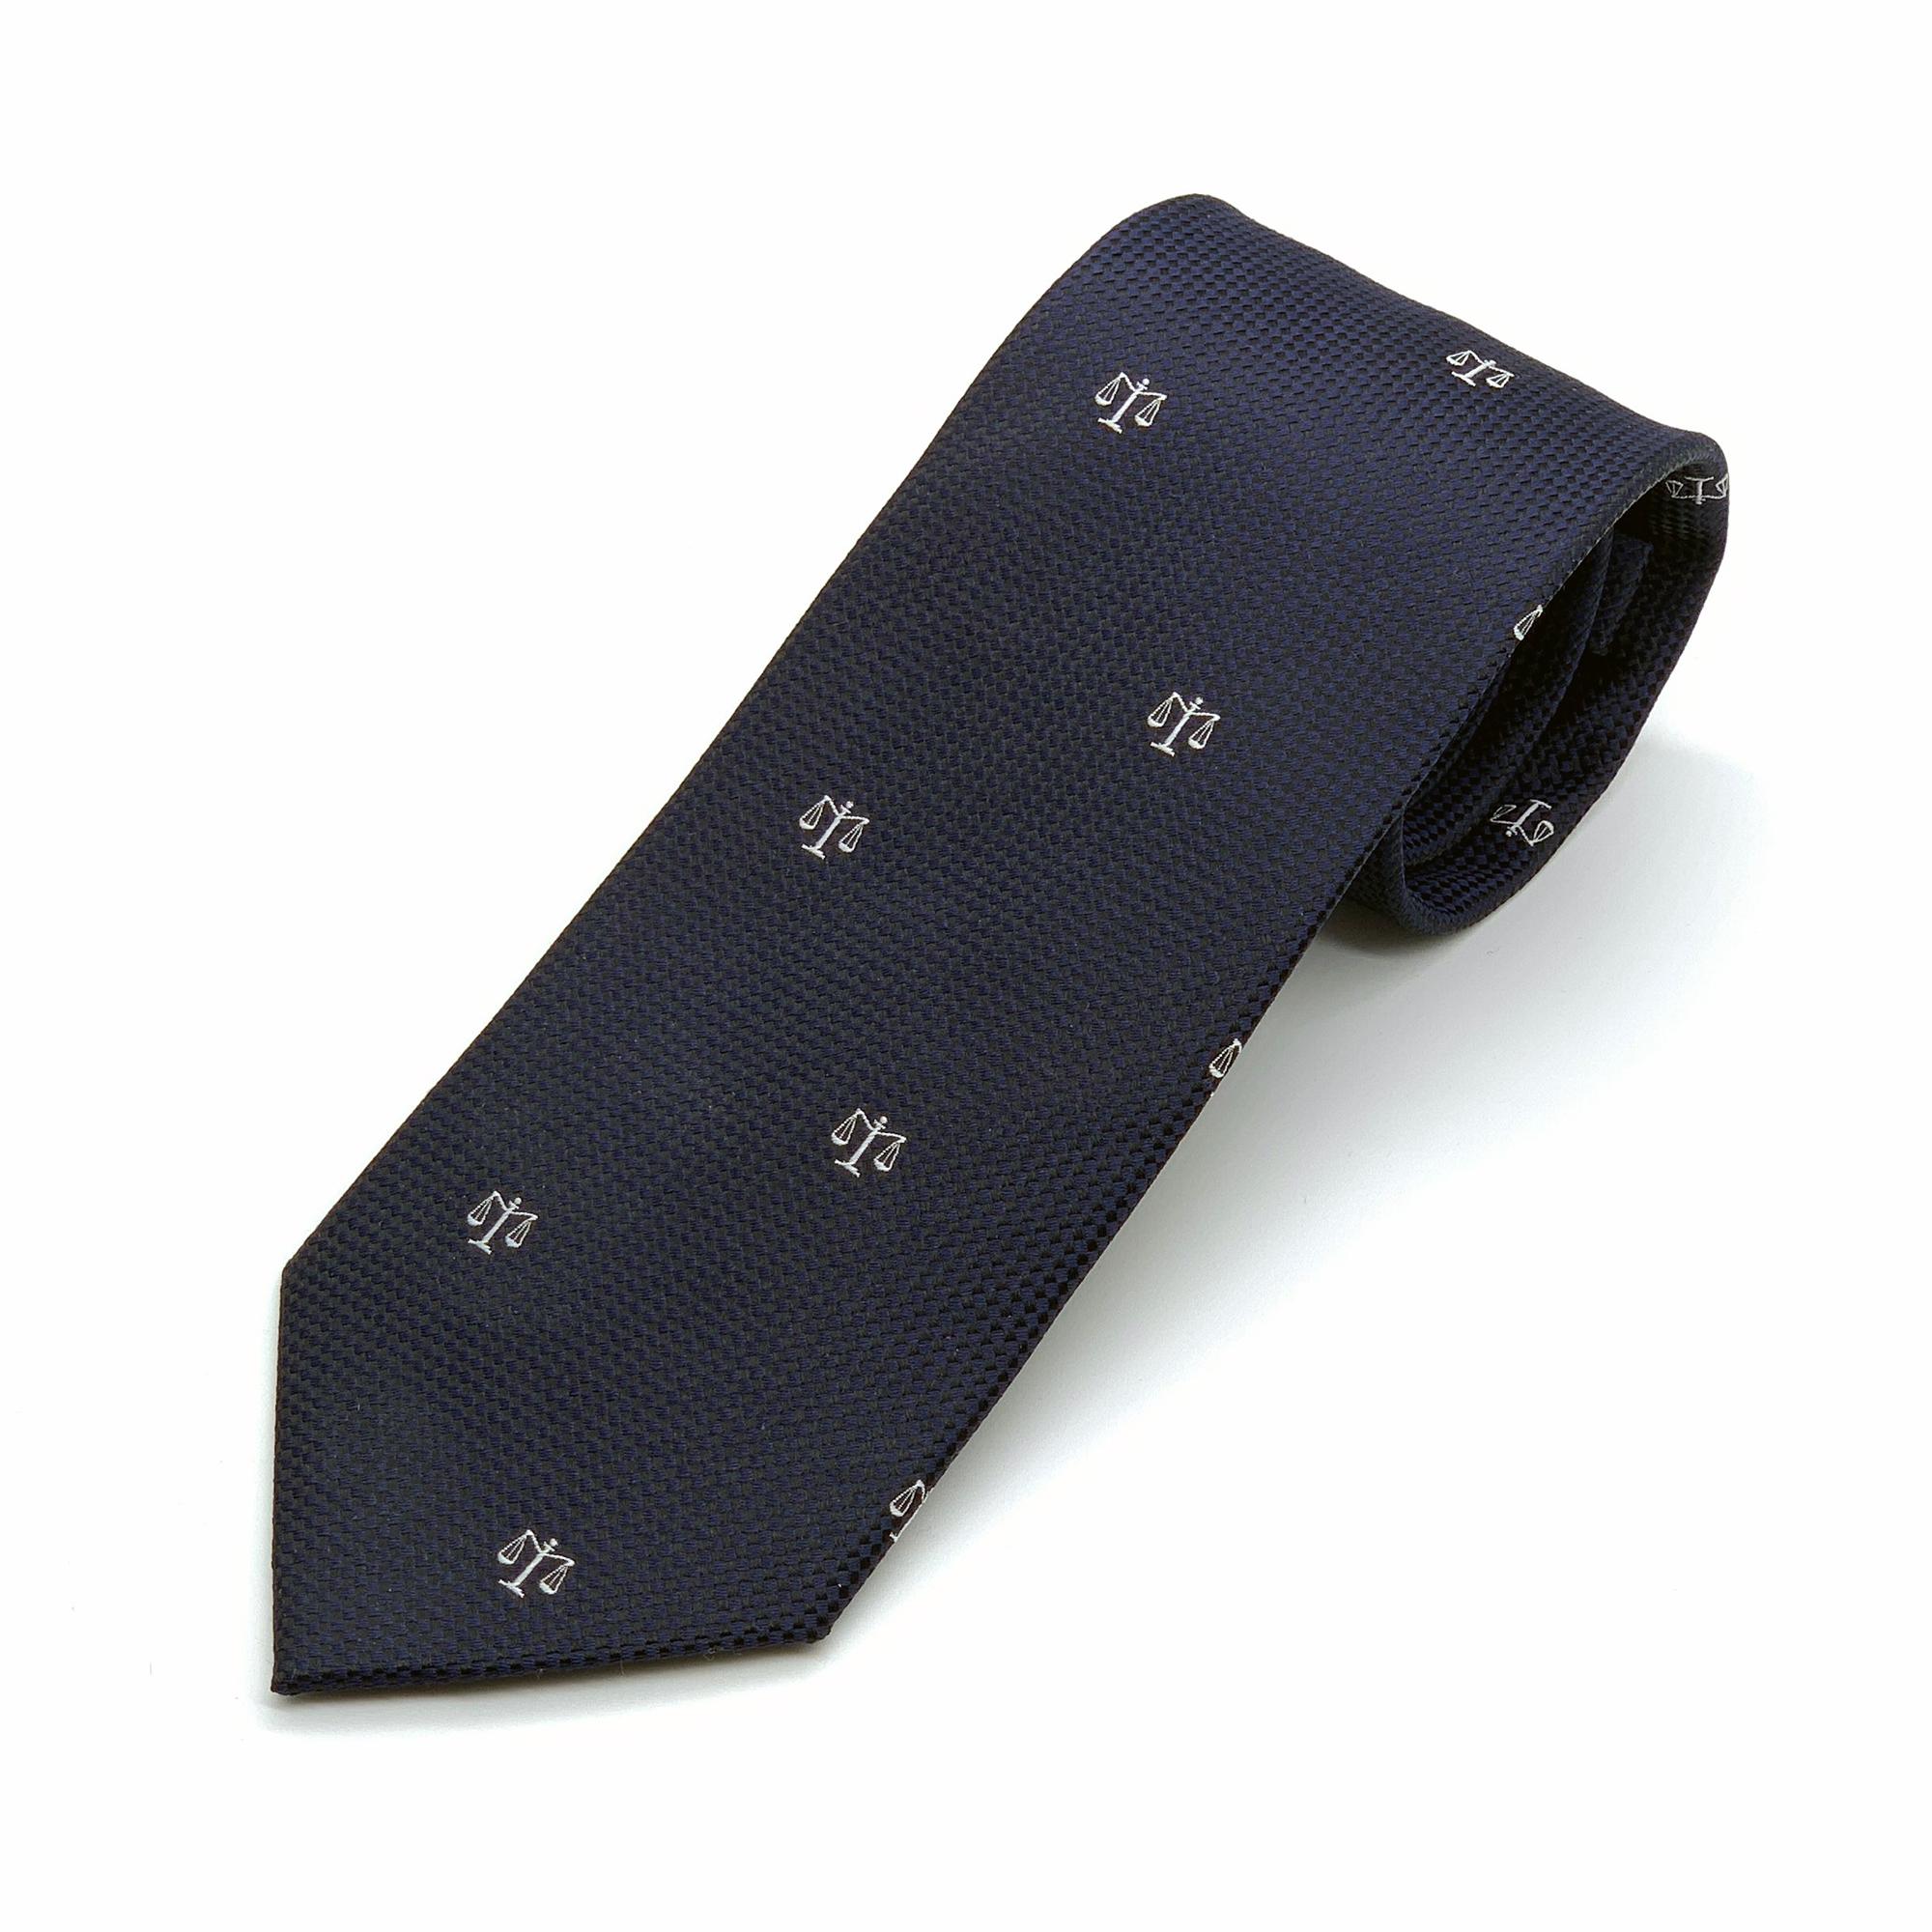 Krawatten Anwaltskammer Jaen